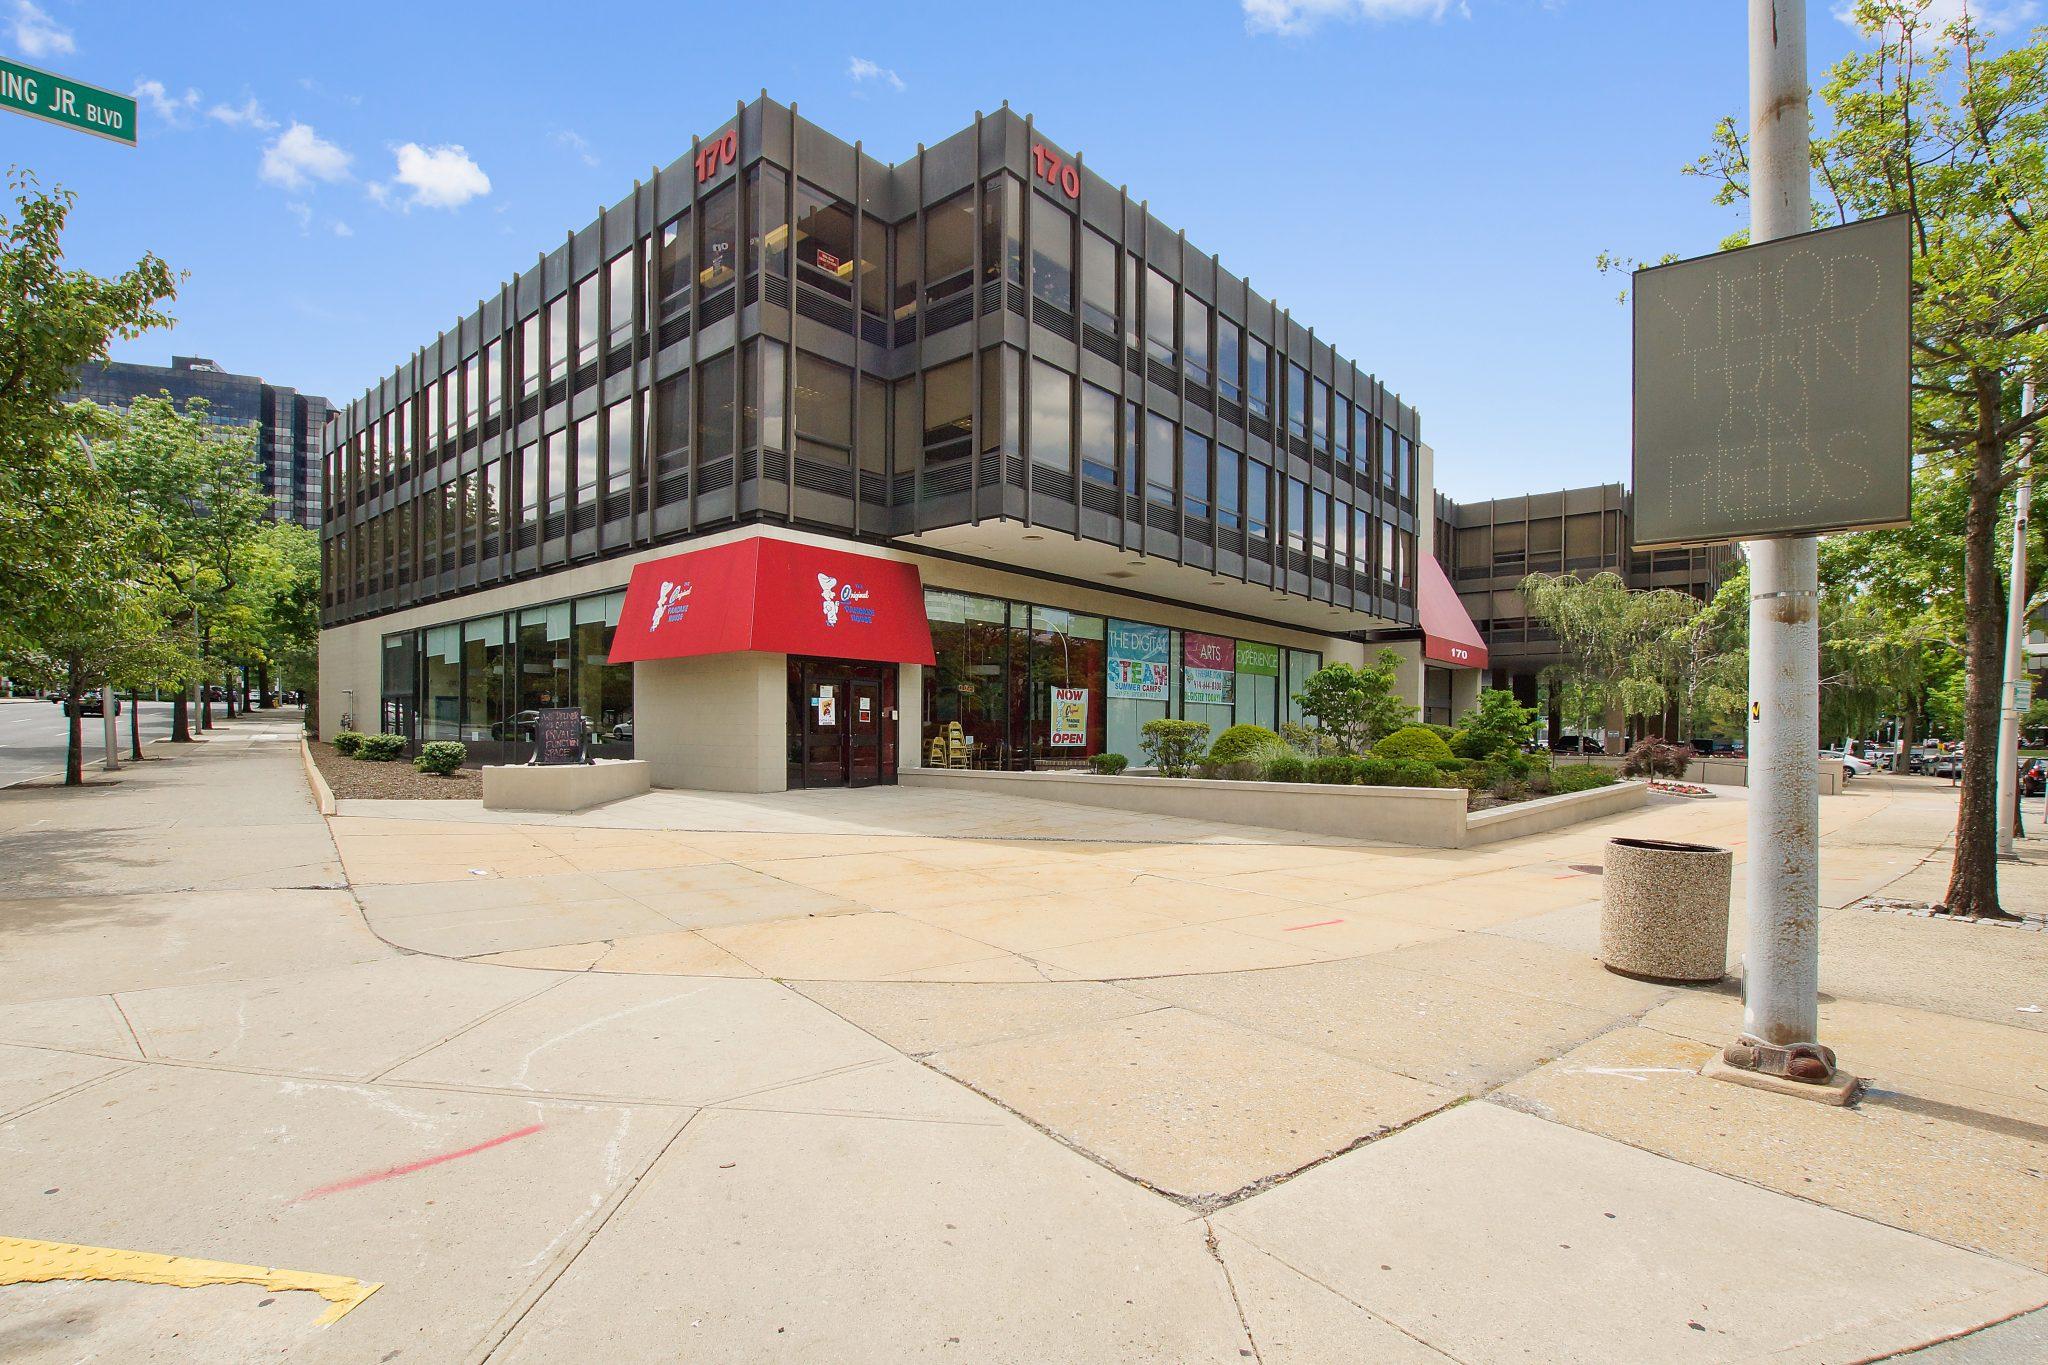 170 Hamilton Avenue – White Plains, NY 10601 – 5,356 sq. ft.